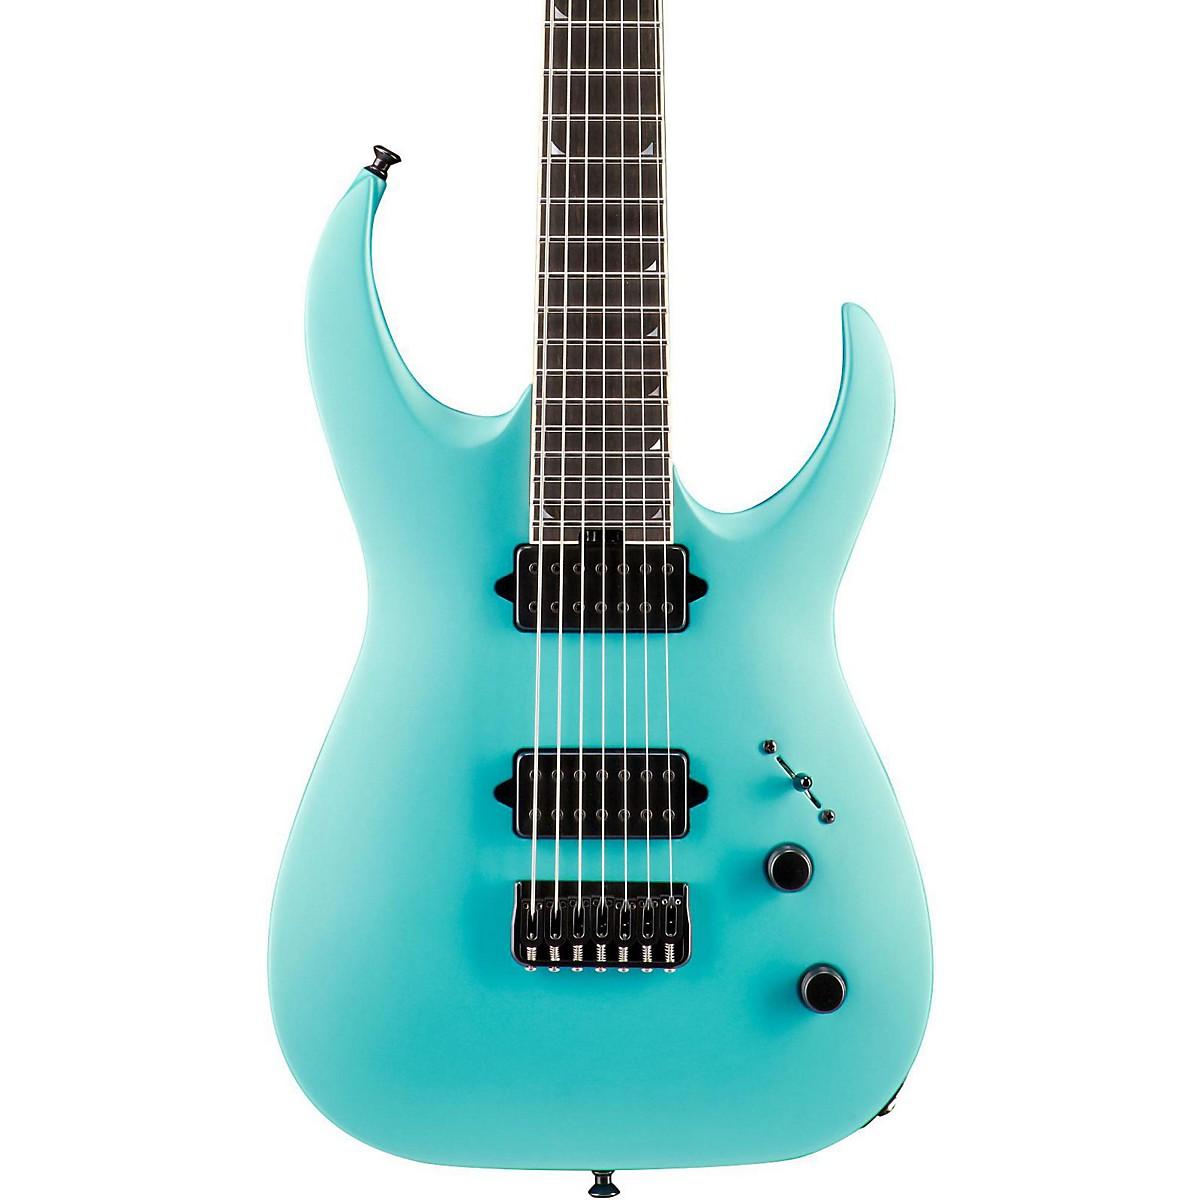 Jackson USA Signature Model Misha Mansoor Juggernaut HT7 Electric Guitar